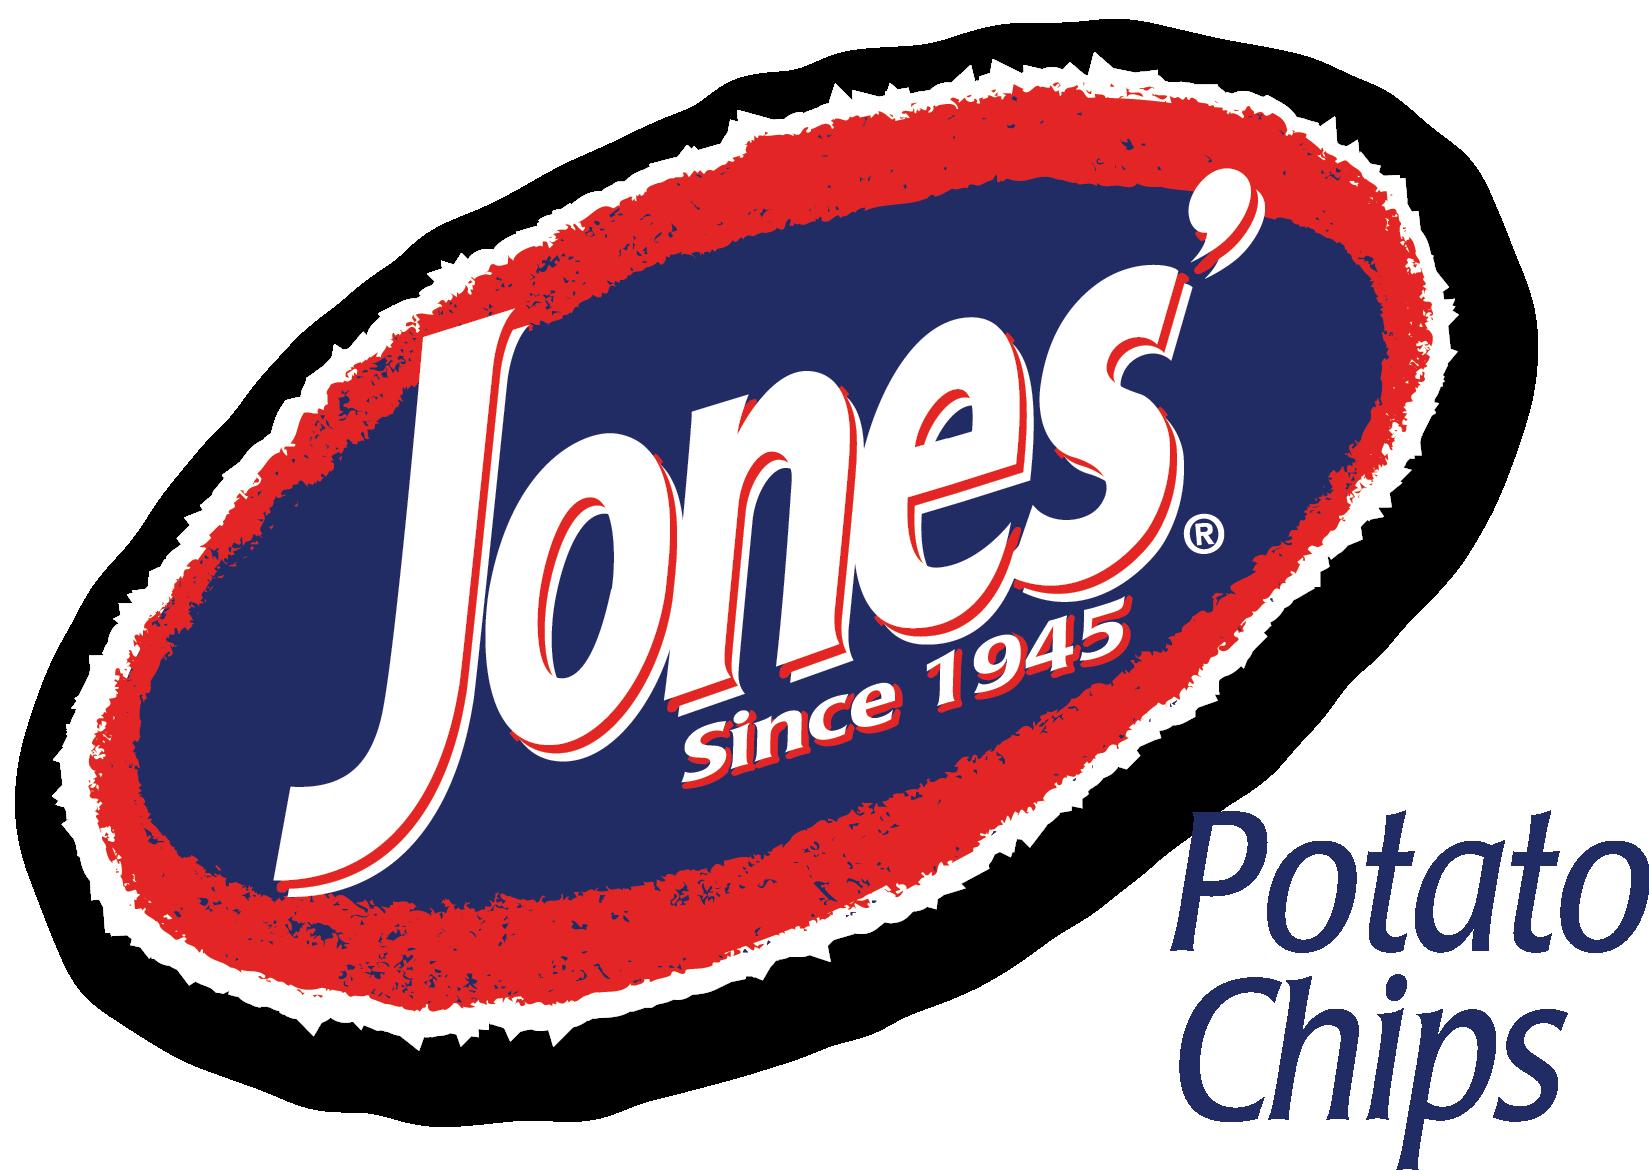 Jones Potato Chip Company